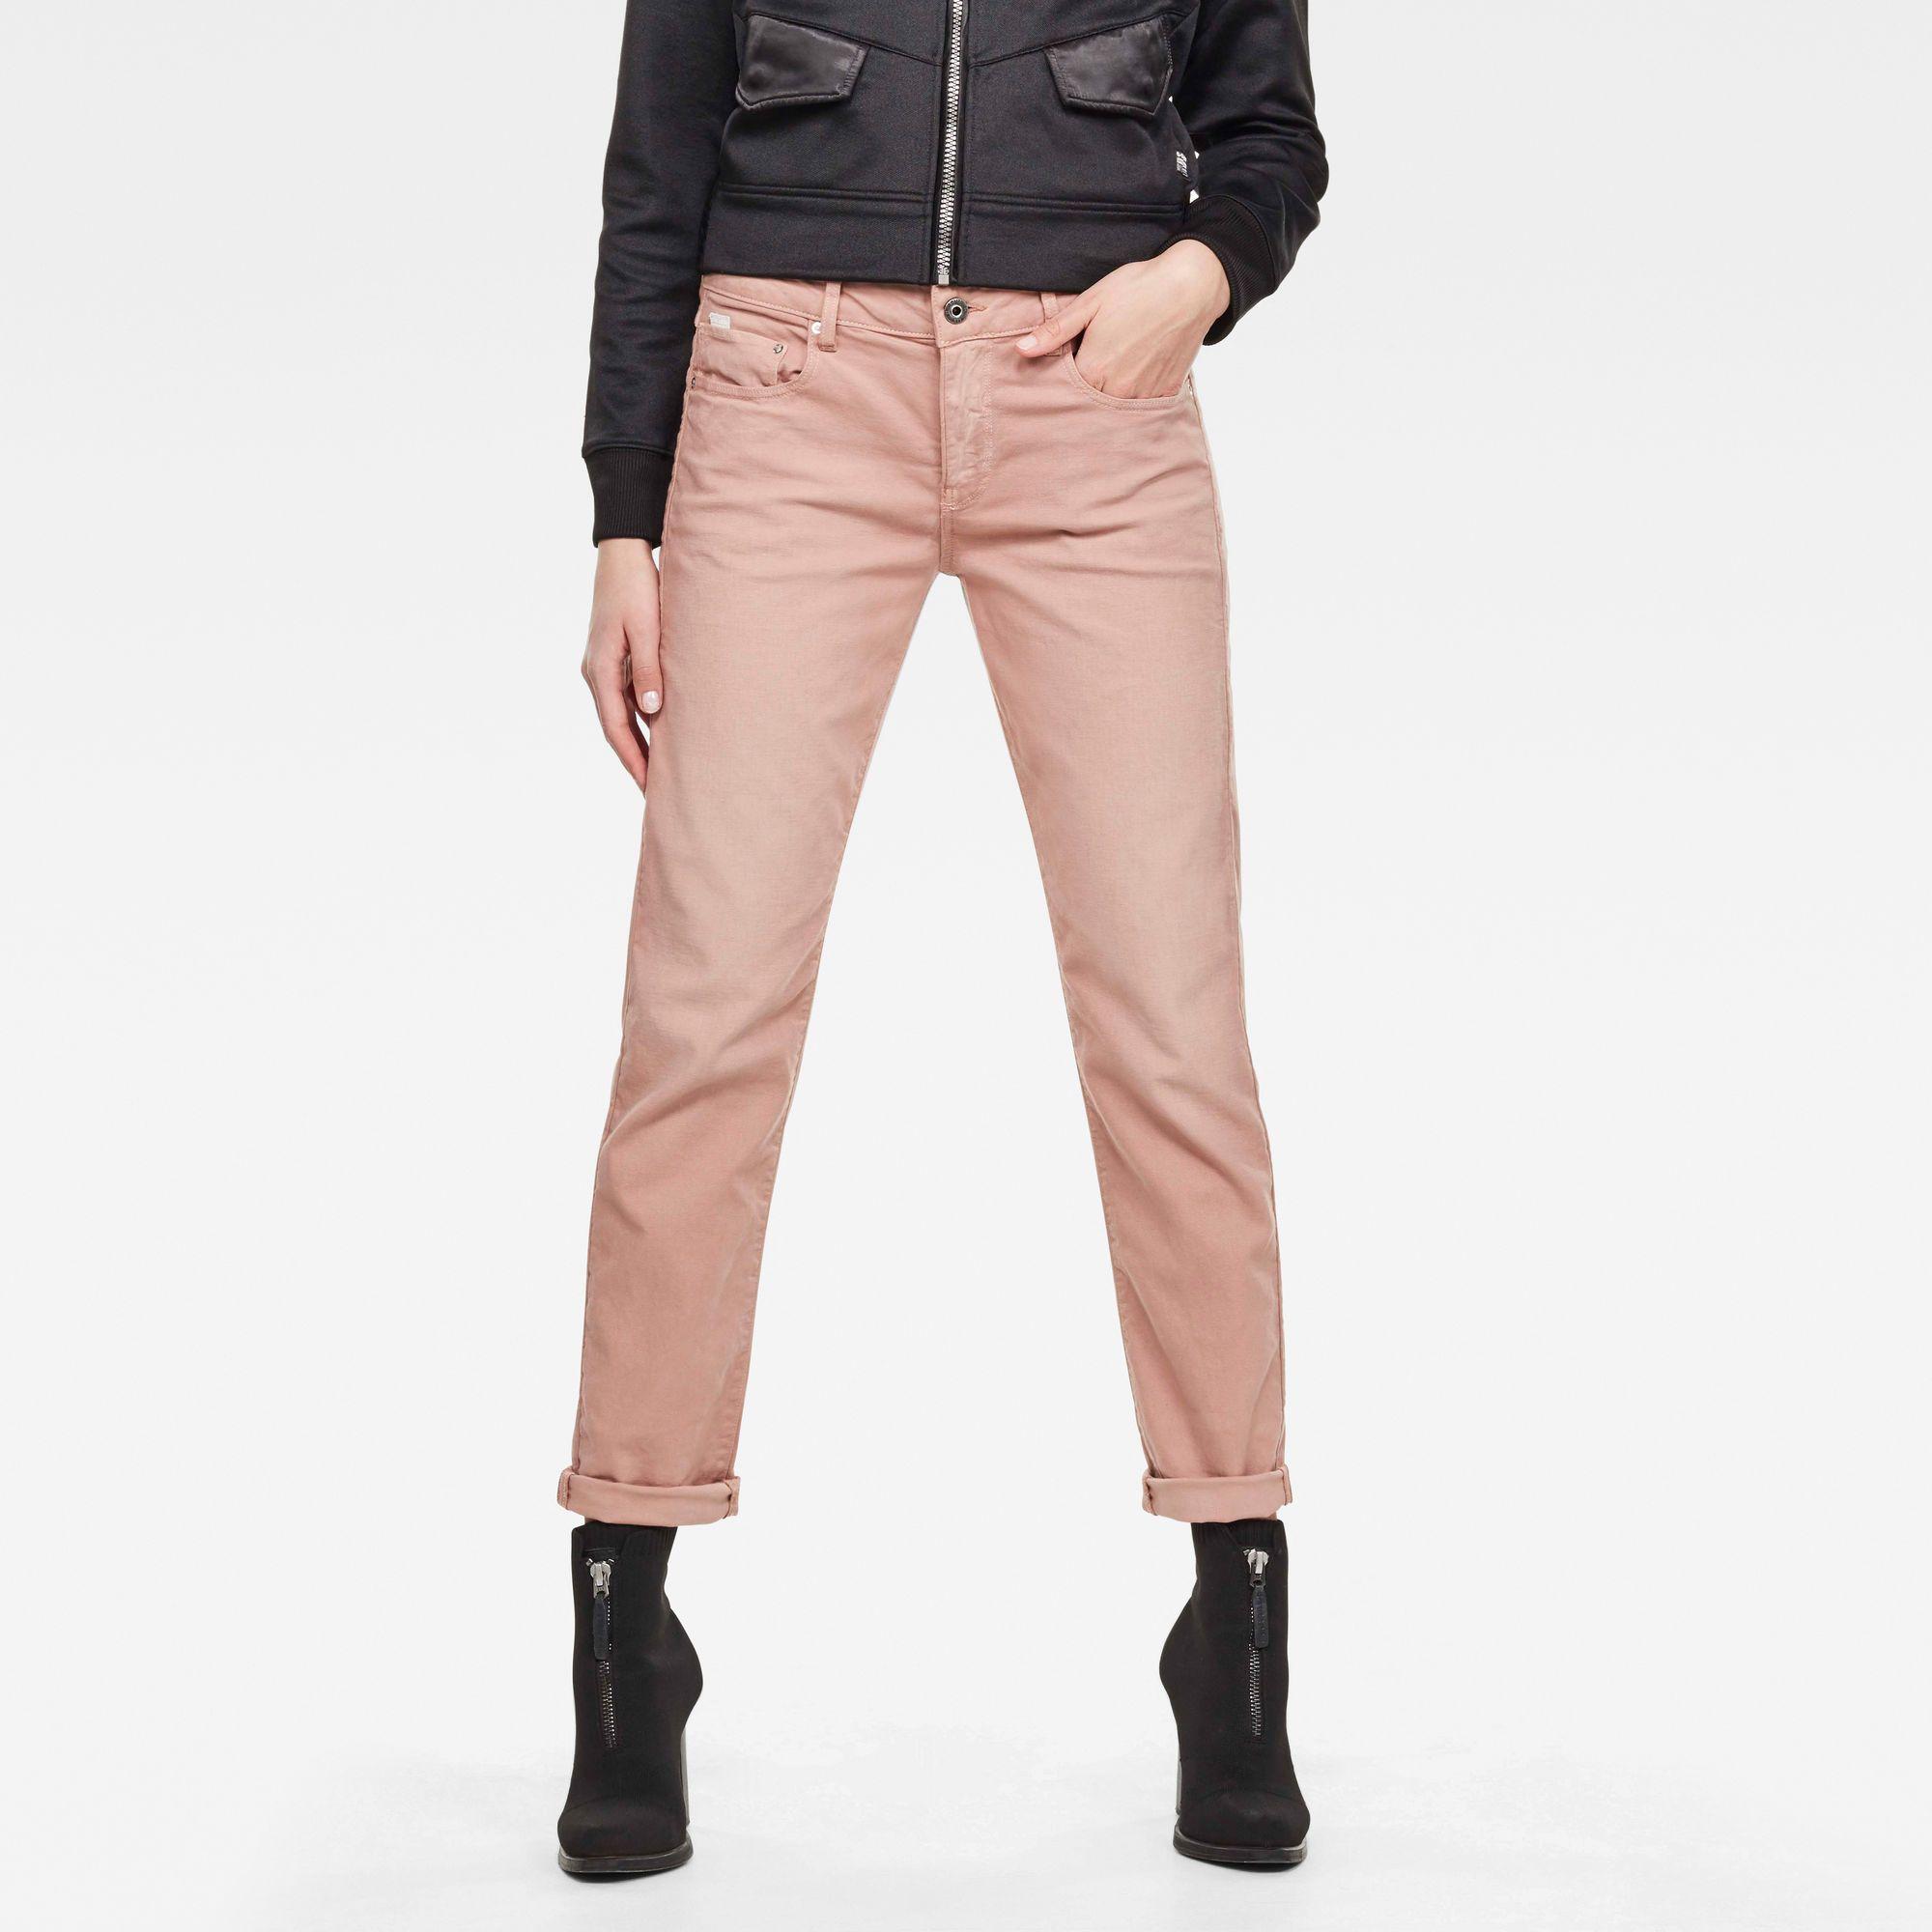 G-Star Raw Kate Boyfriend Coloured Jeans